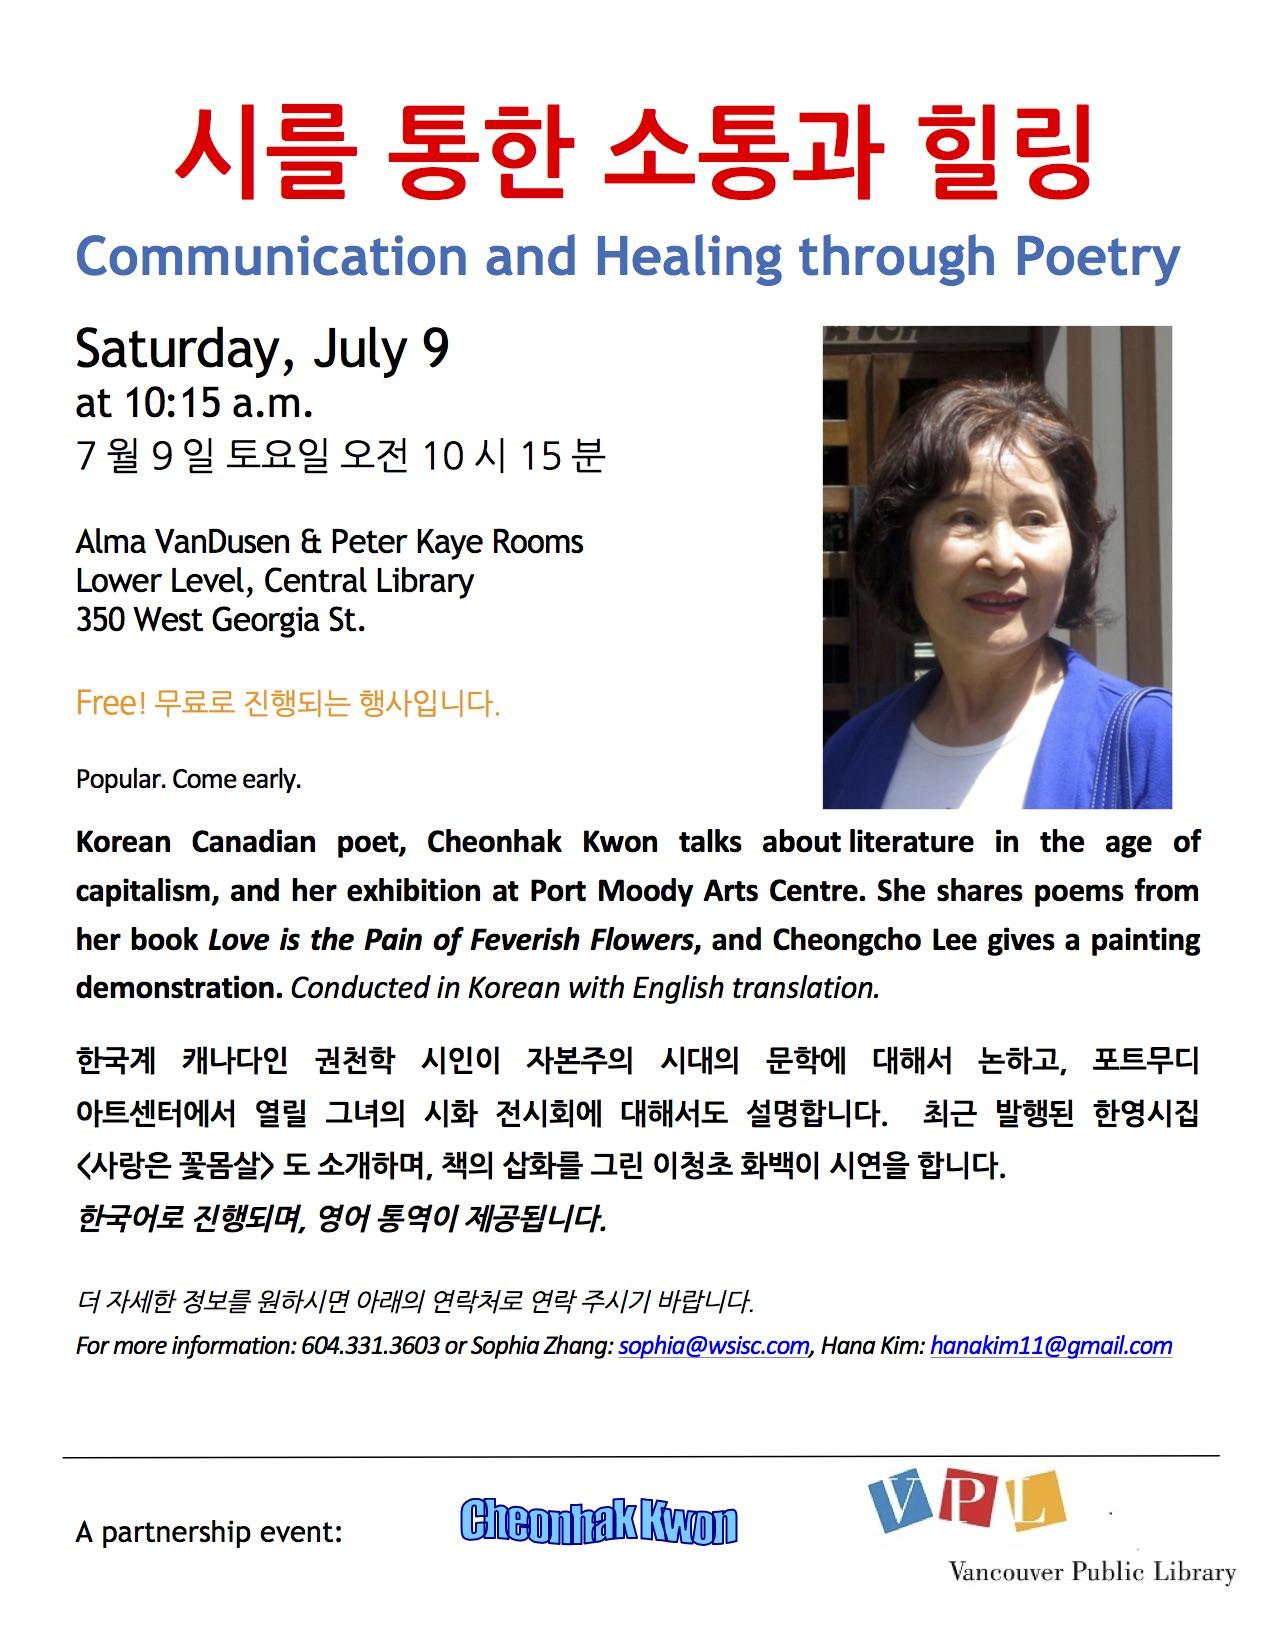 VPL_Poster_CheonhakKwon